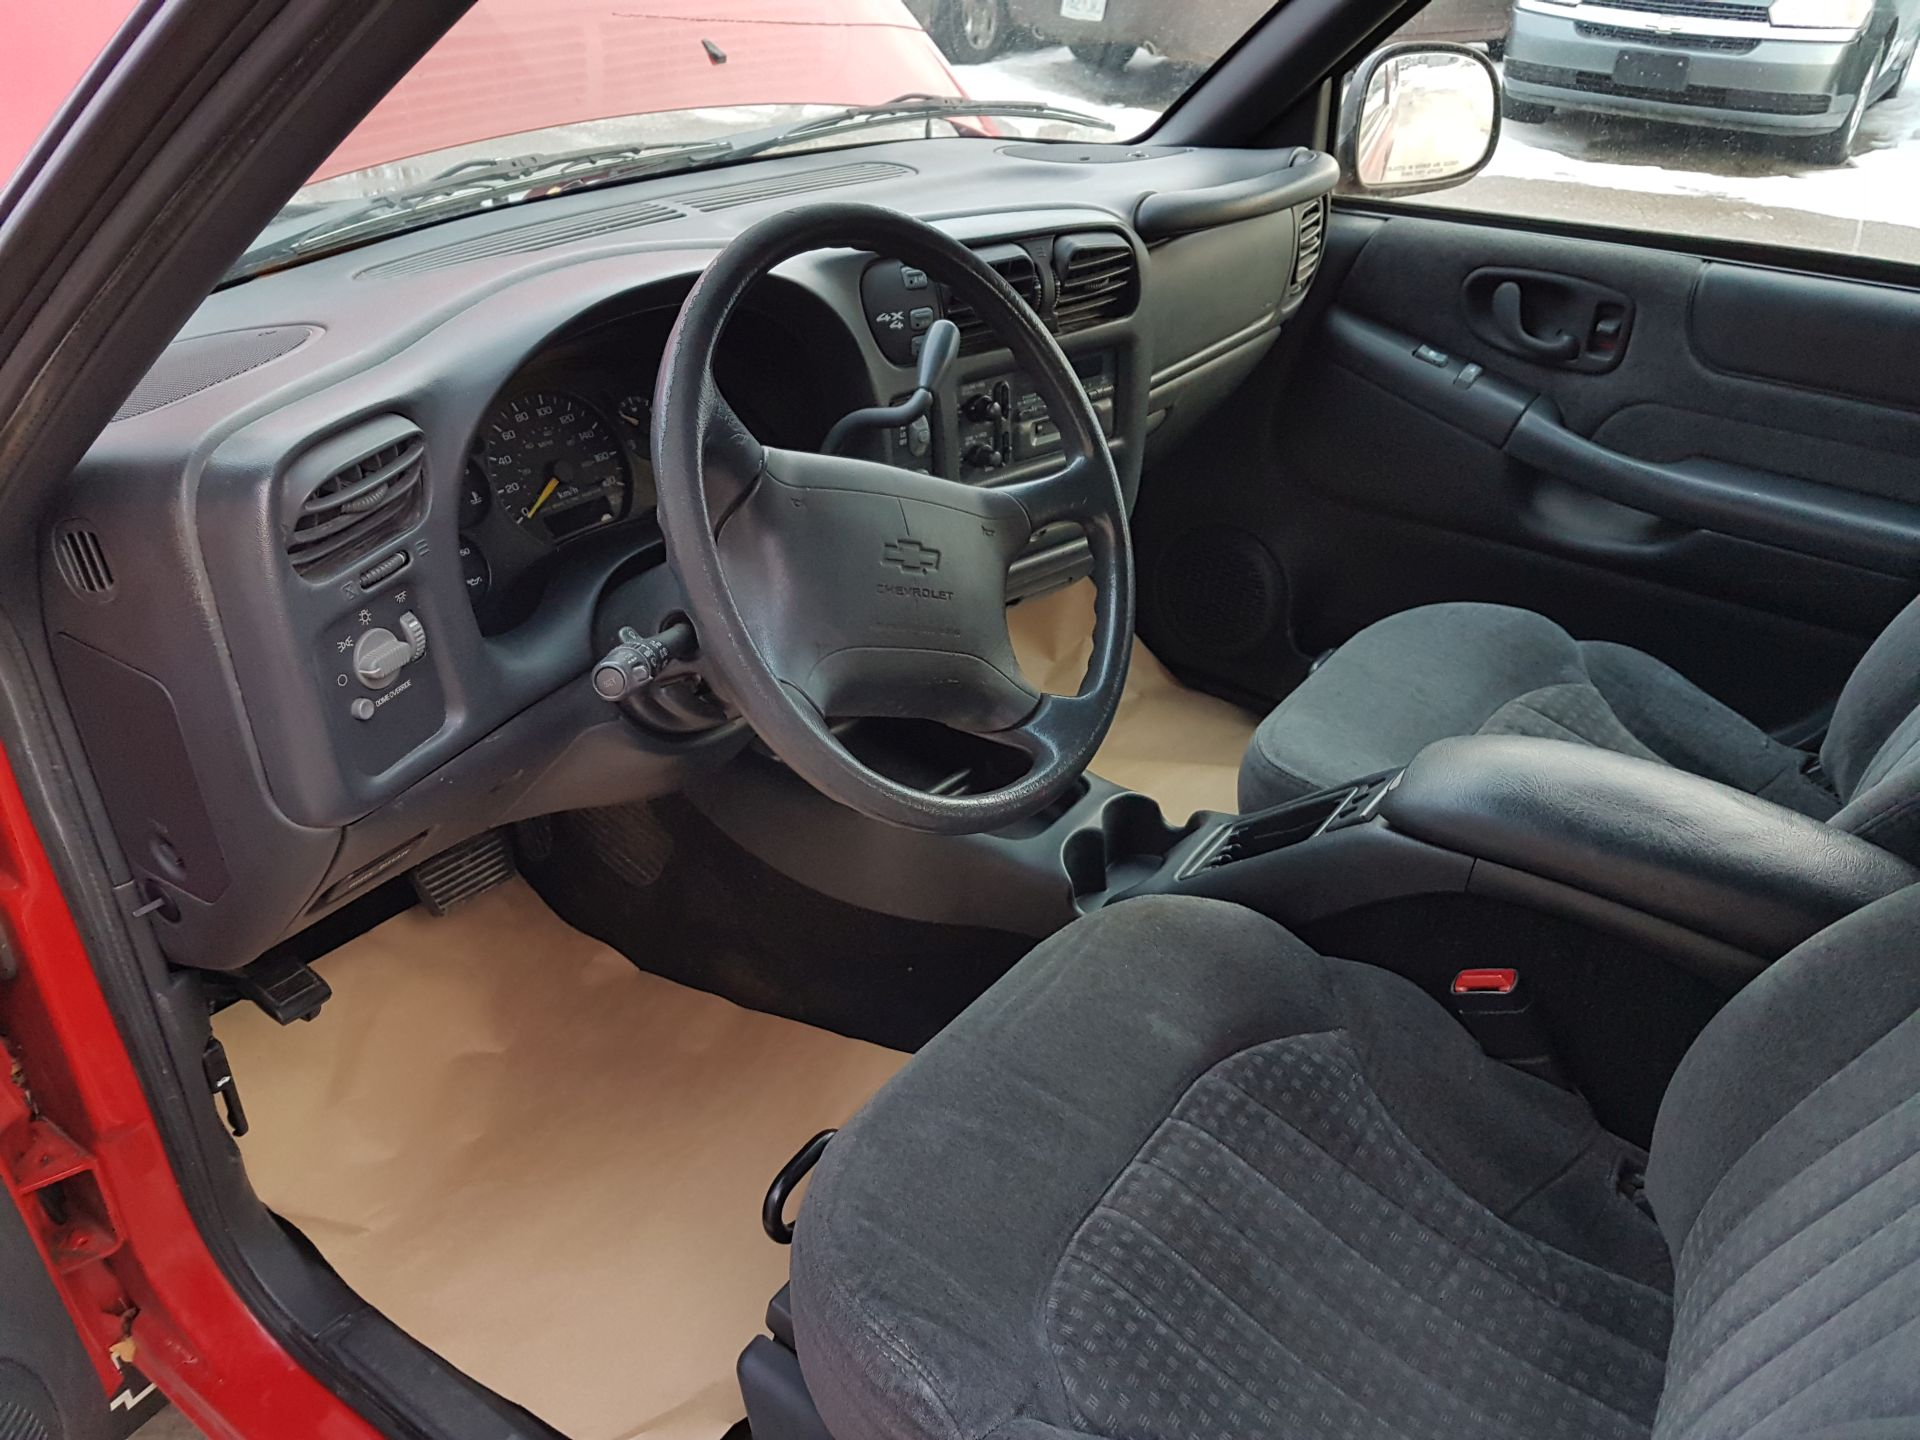 Chevrolet Blazer 4WD | GTR Auto Sales